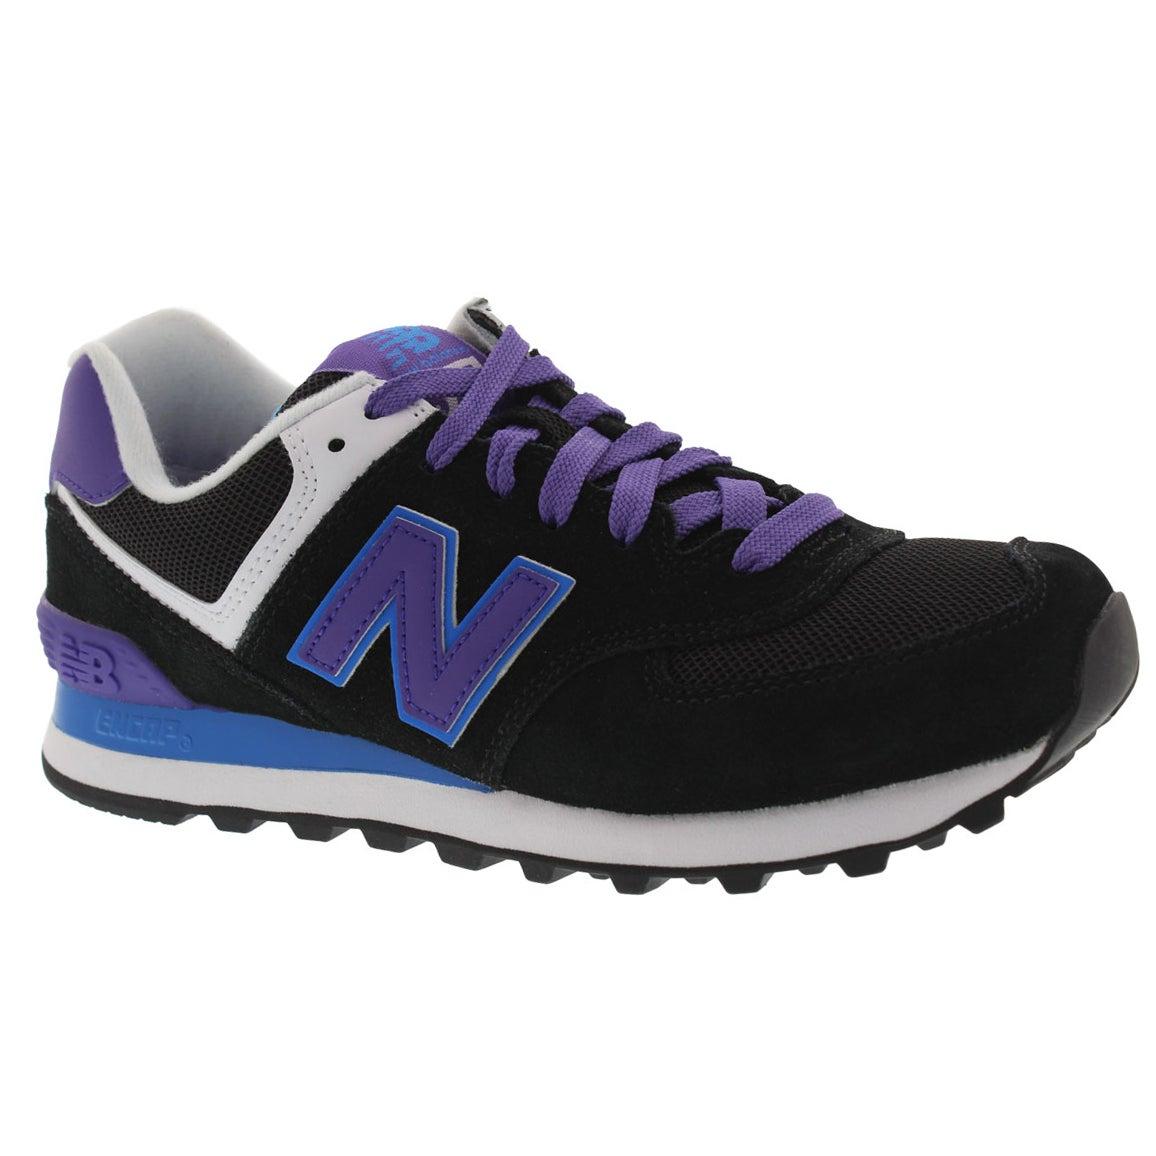 Women's 574 black/blue lace up sneakers